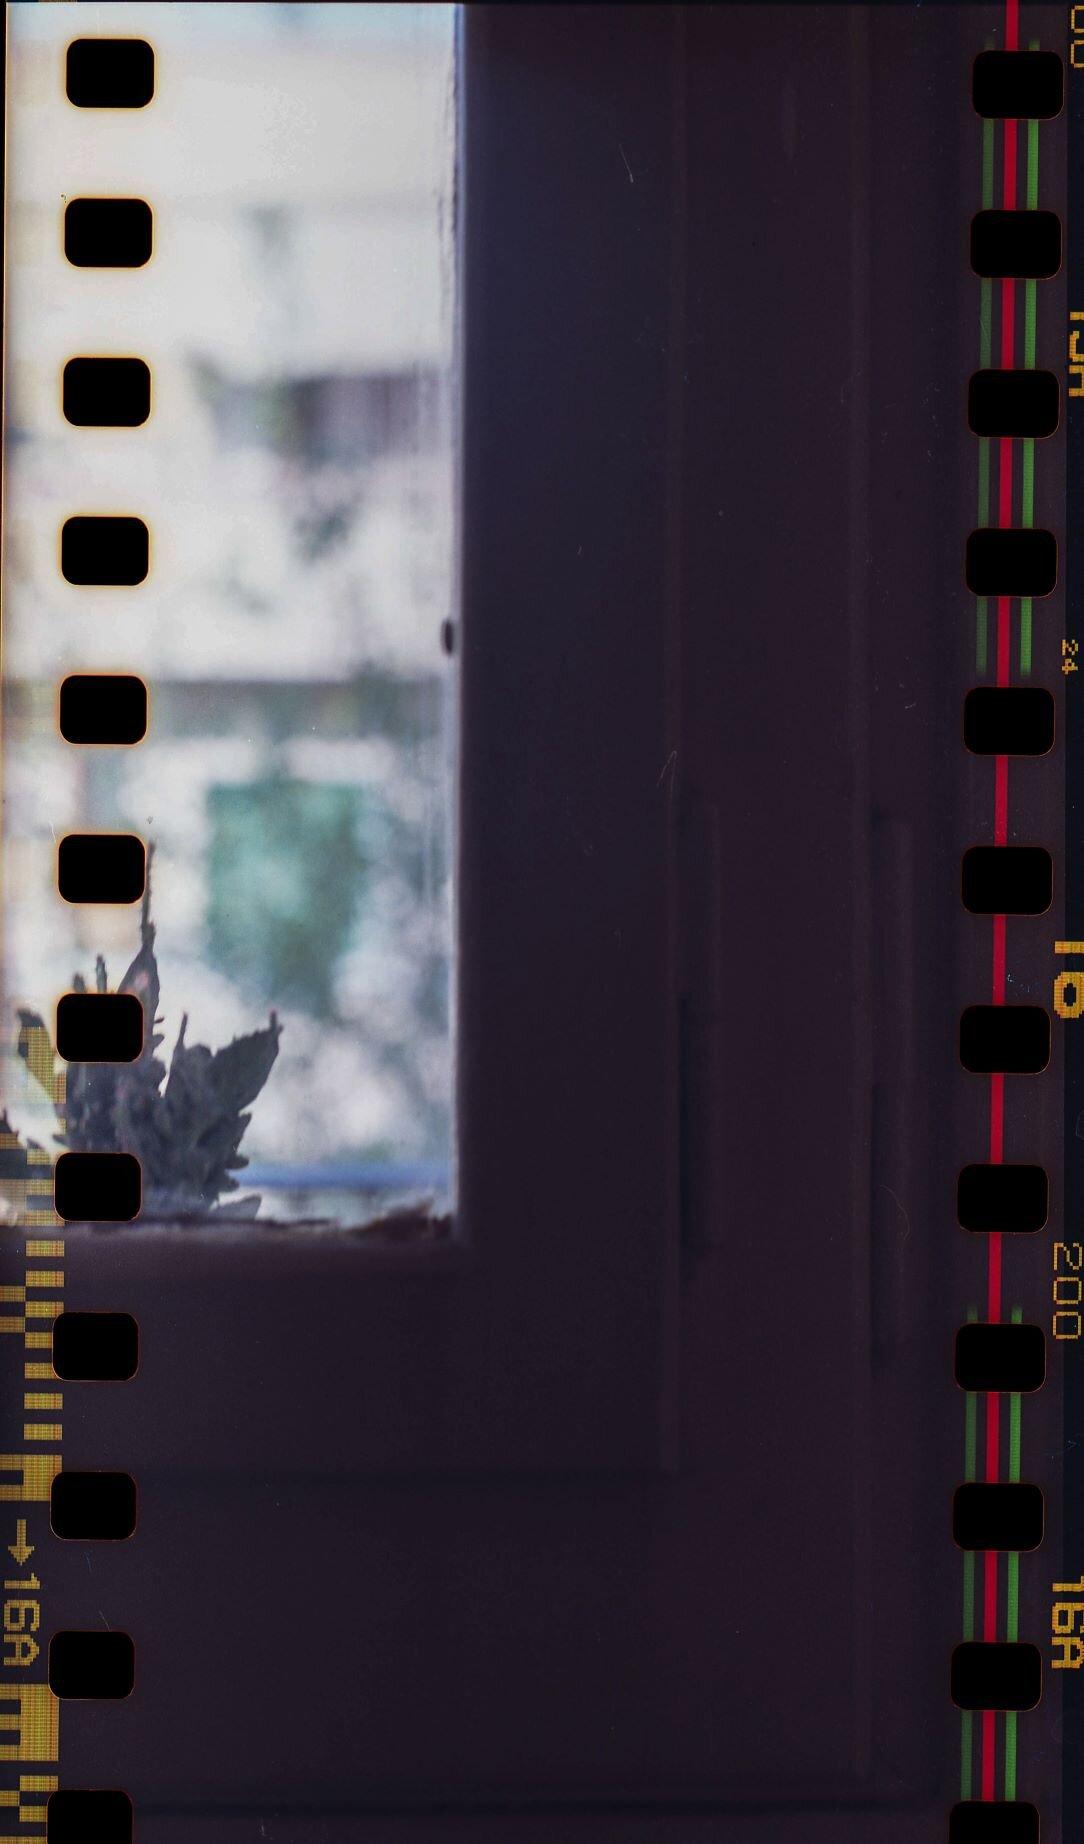 HASS-COL-FUJ-200-35mm-006.jpg